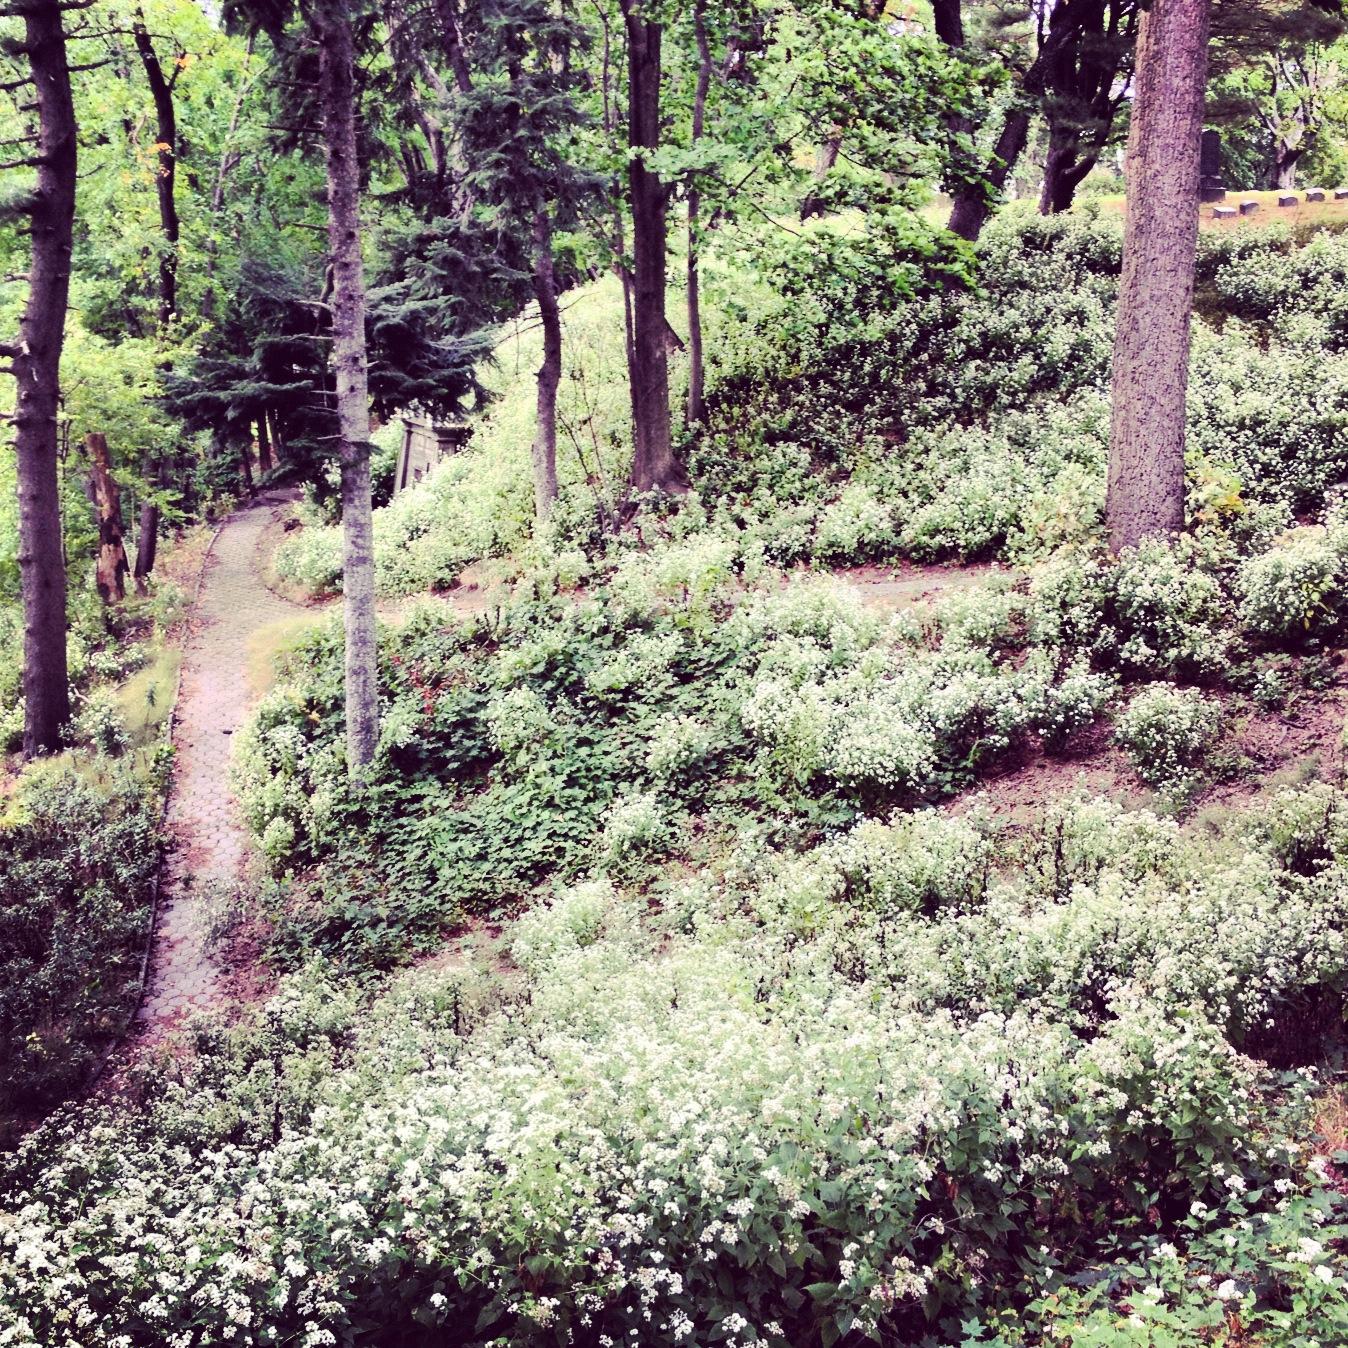 green slope, photo by Maré Hieronimus